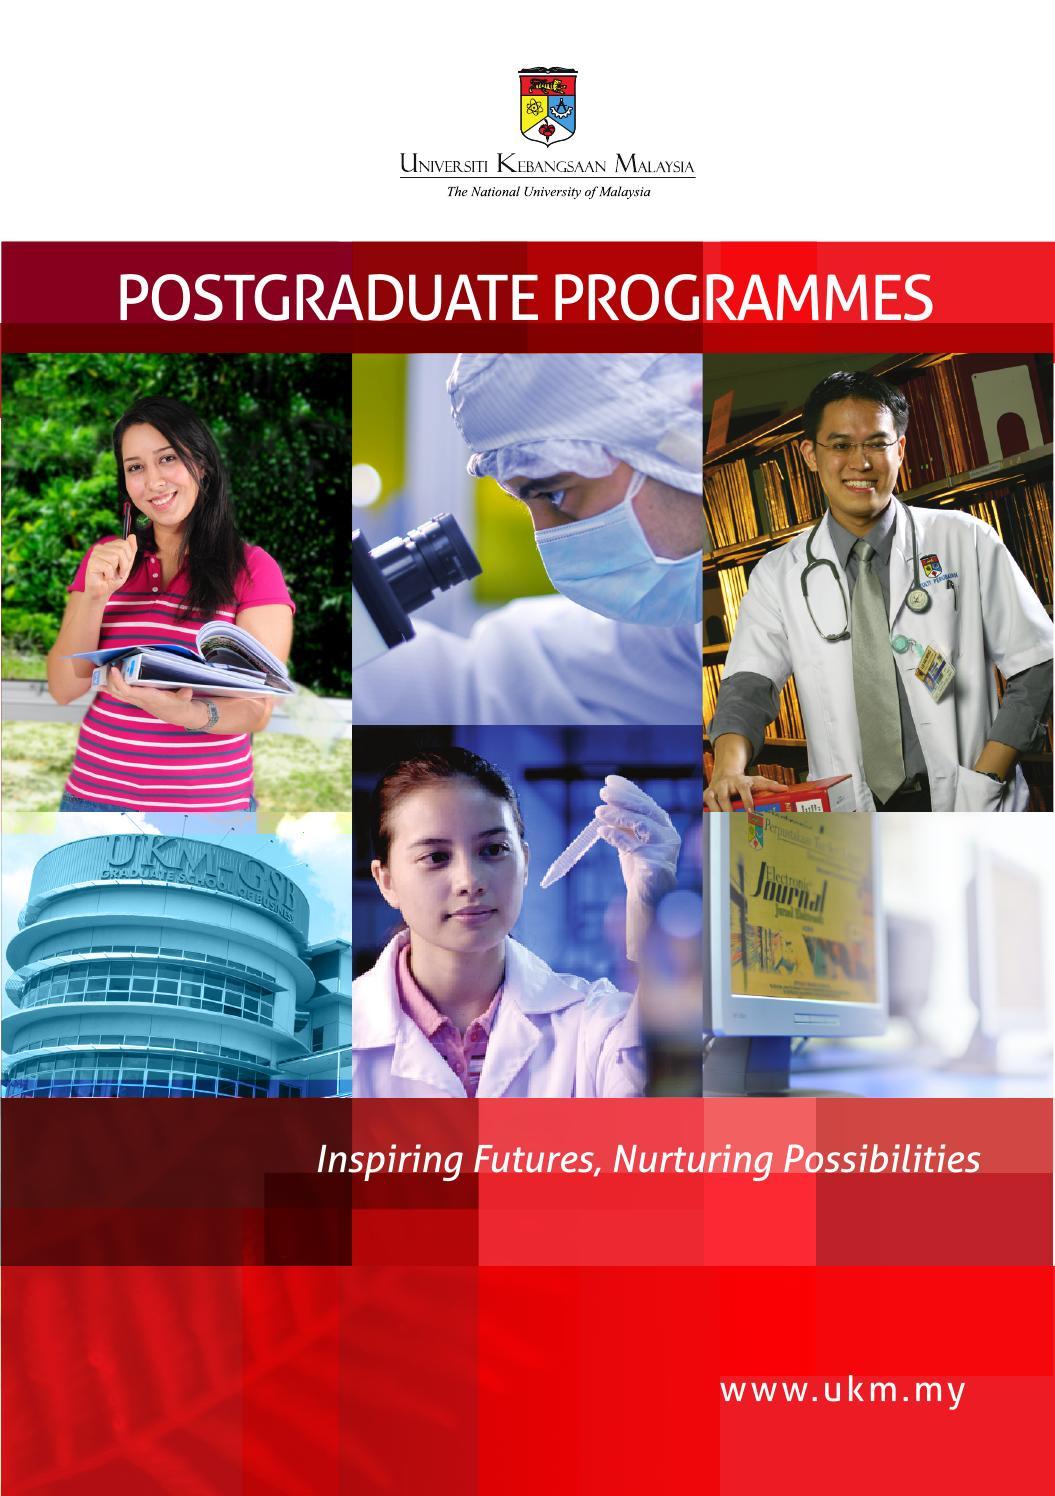 National University Of Malaysia Ukm Postgraduate Programmes Prospectus By Cn Very Issuu